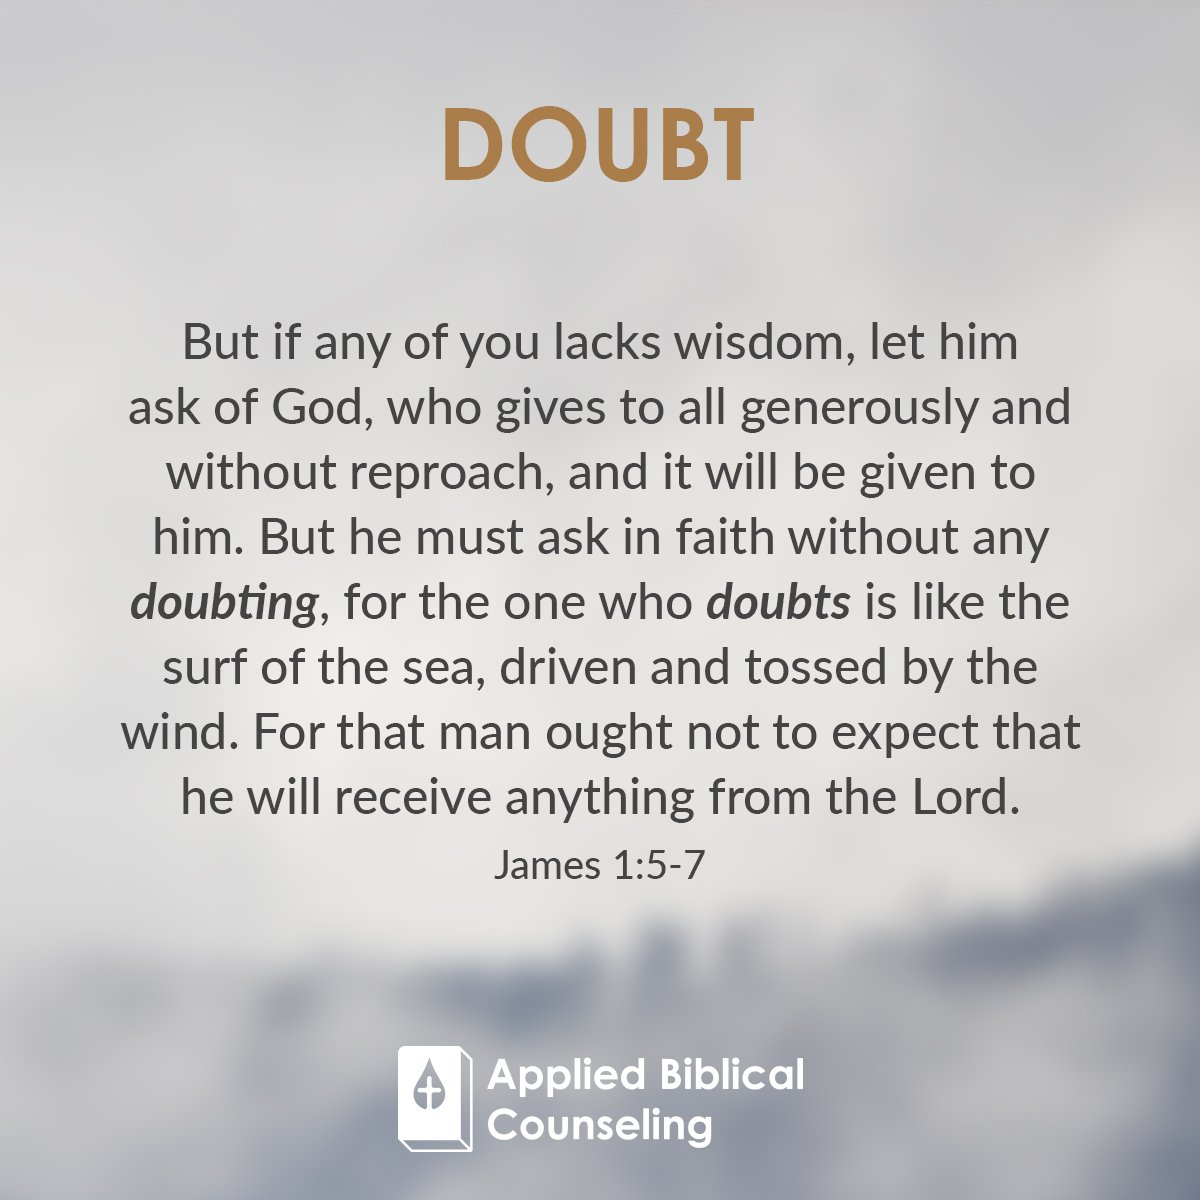 Doubt 1